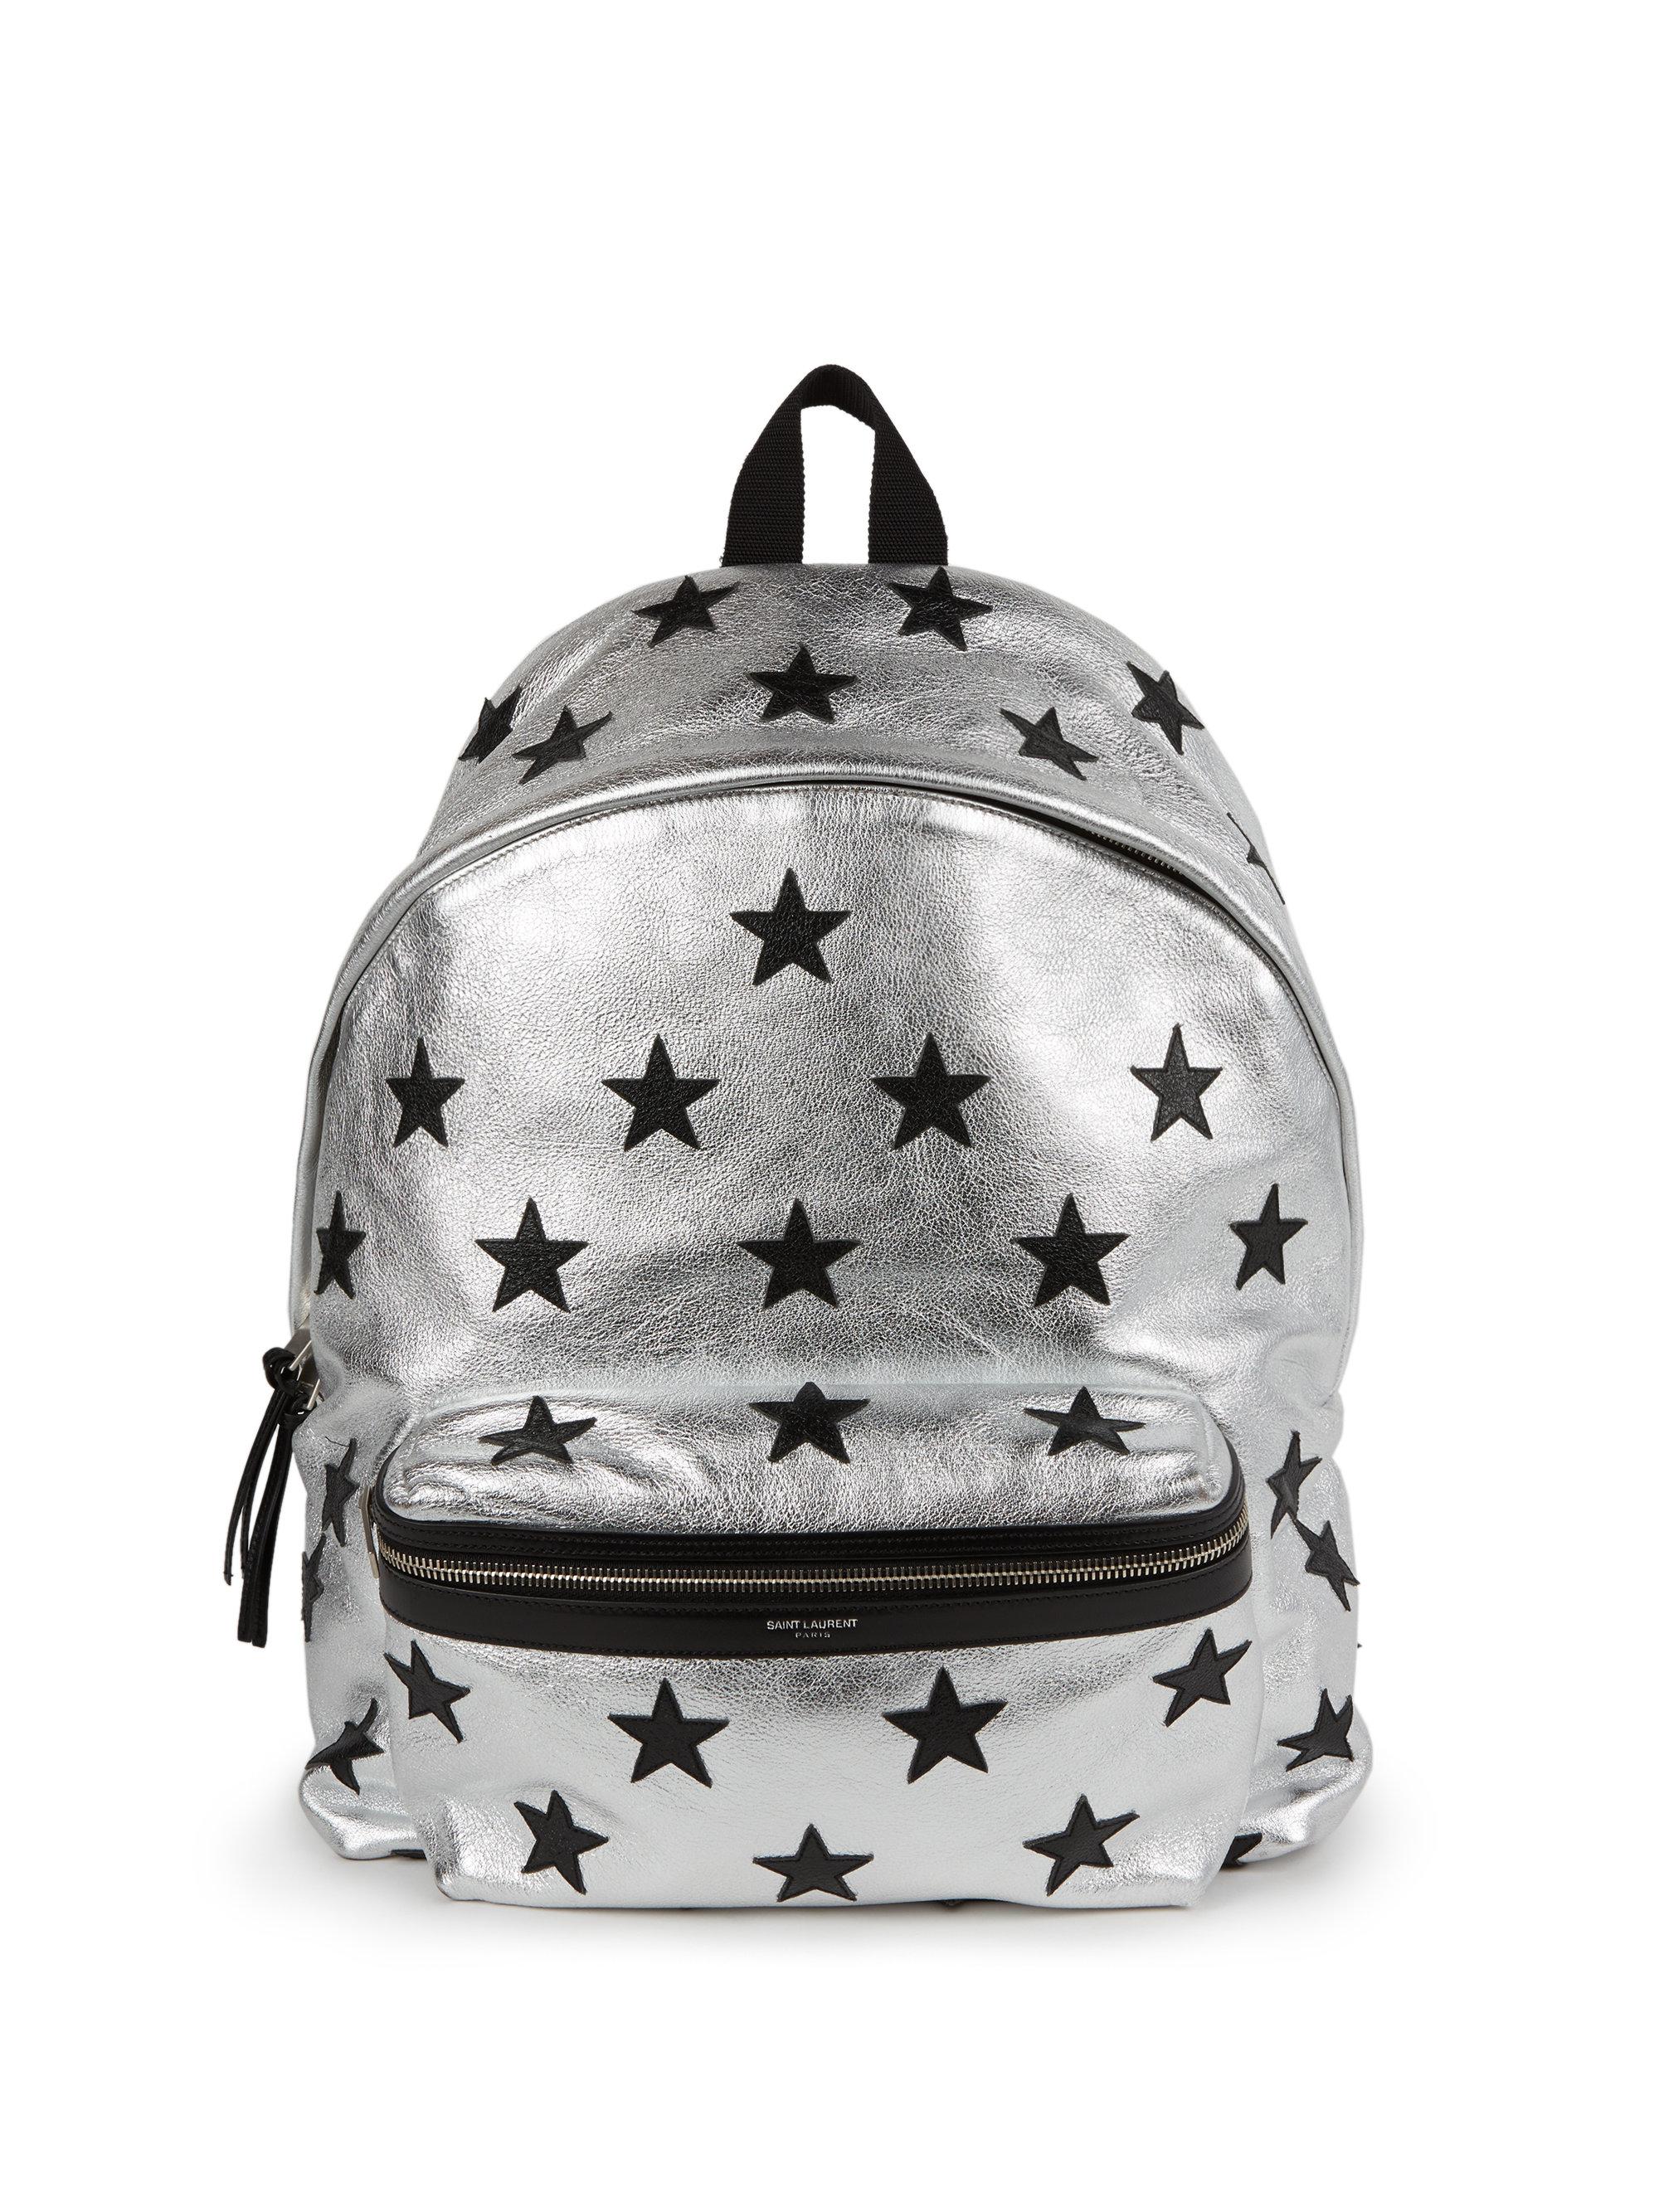 c67474942d35 Lyst - Saint Laurent Classic Hunting California Star Backpack in ...